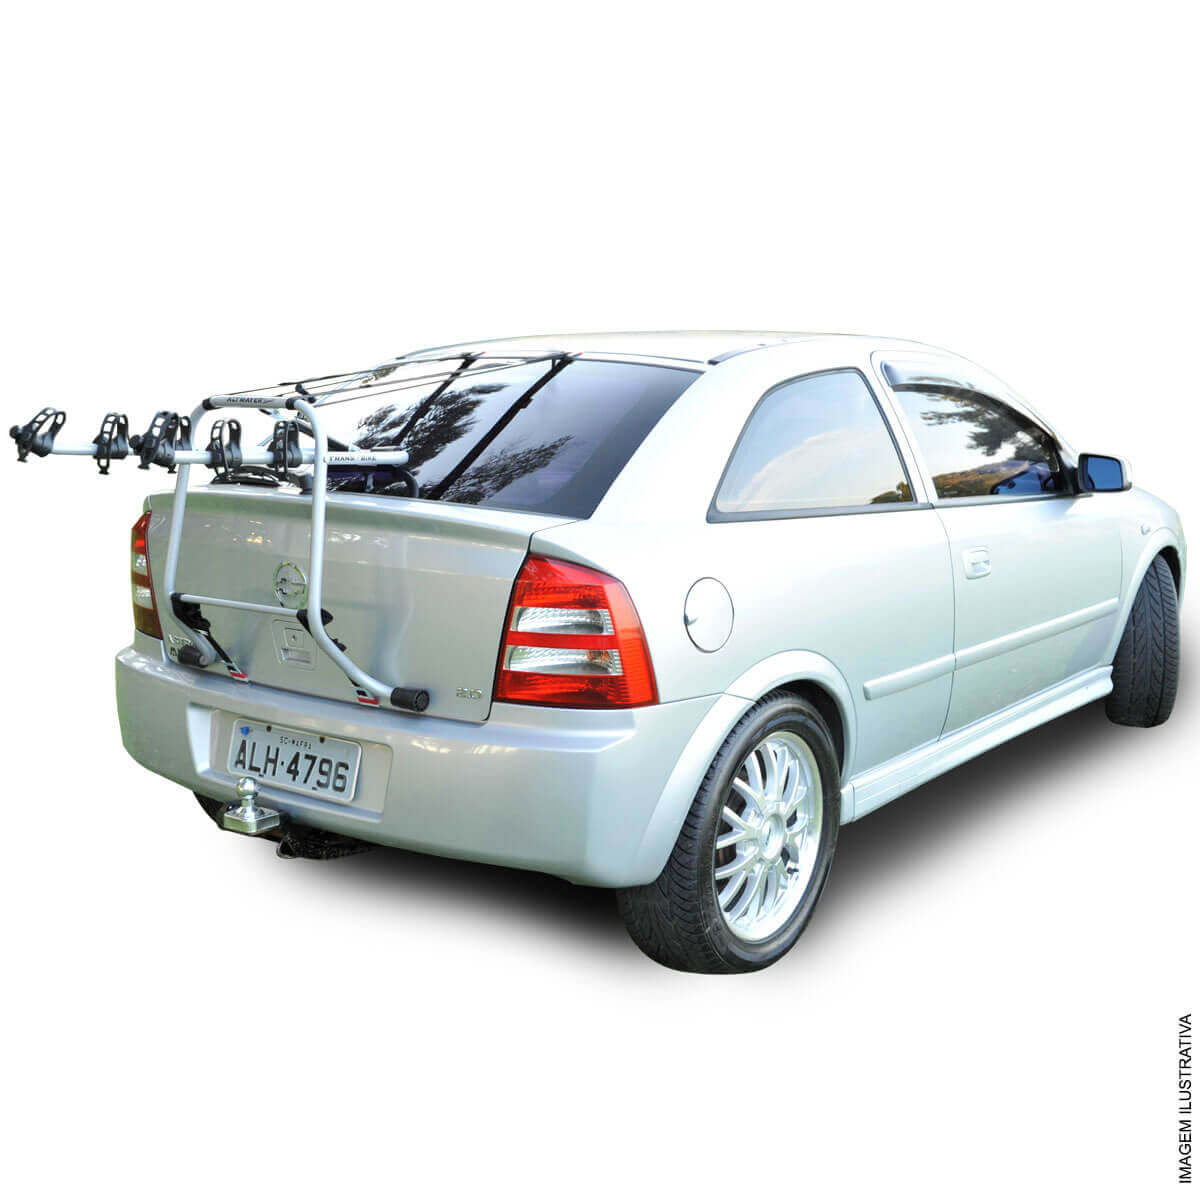 Transbike luxo fixado no porta malas carros hatch e sedan p/ 3 bicicletas